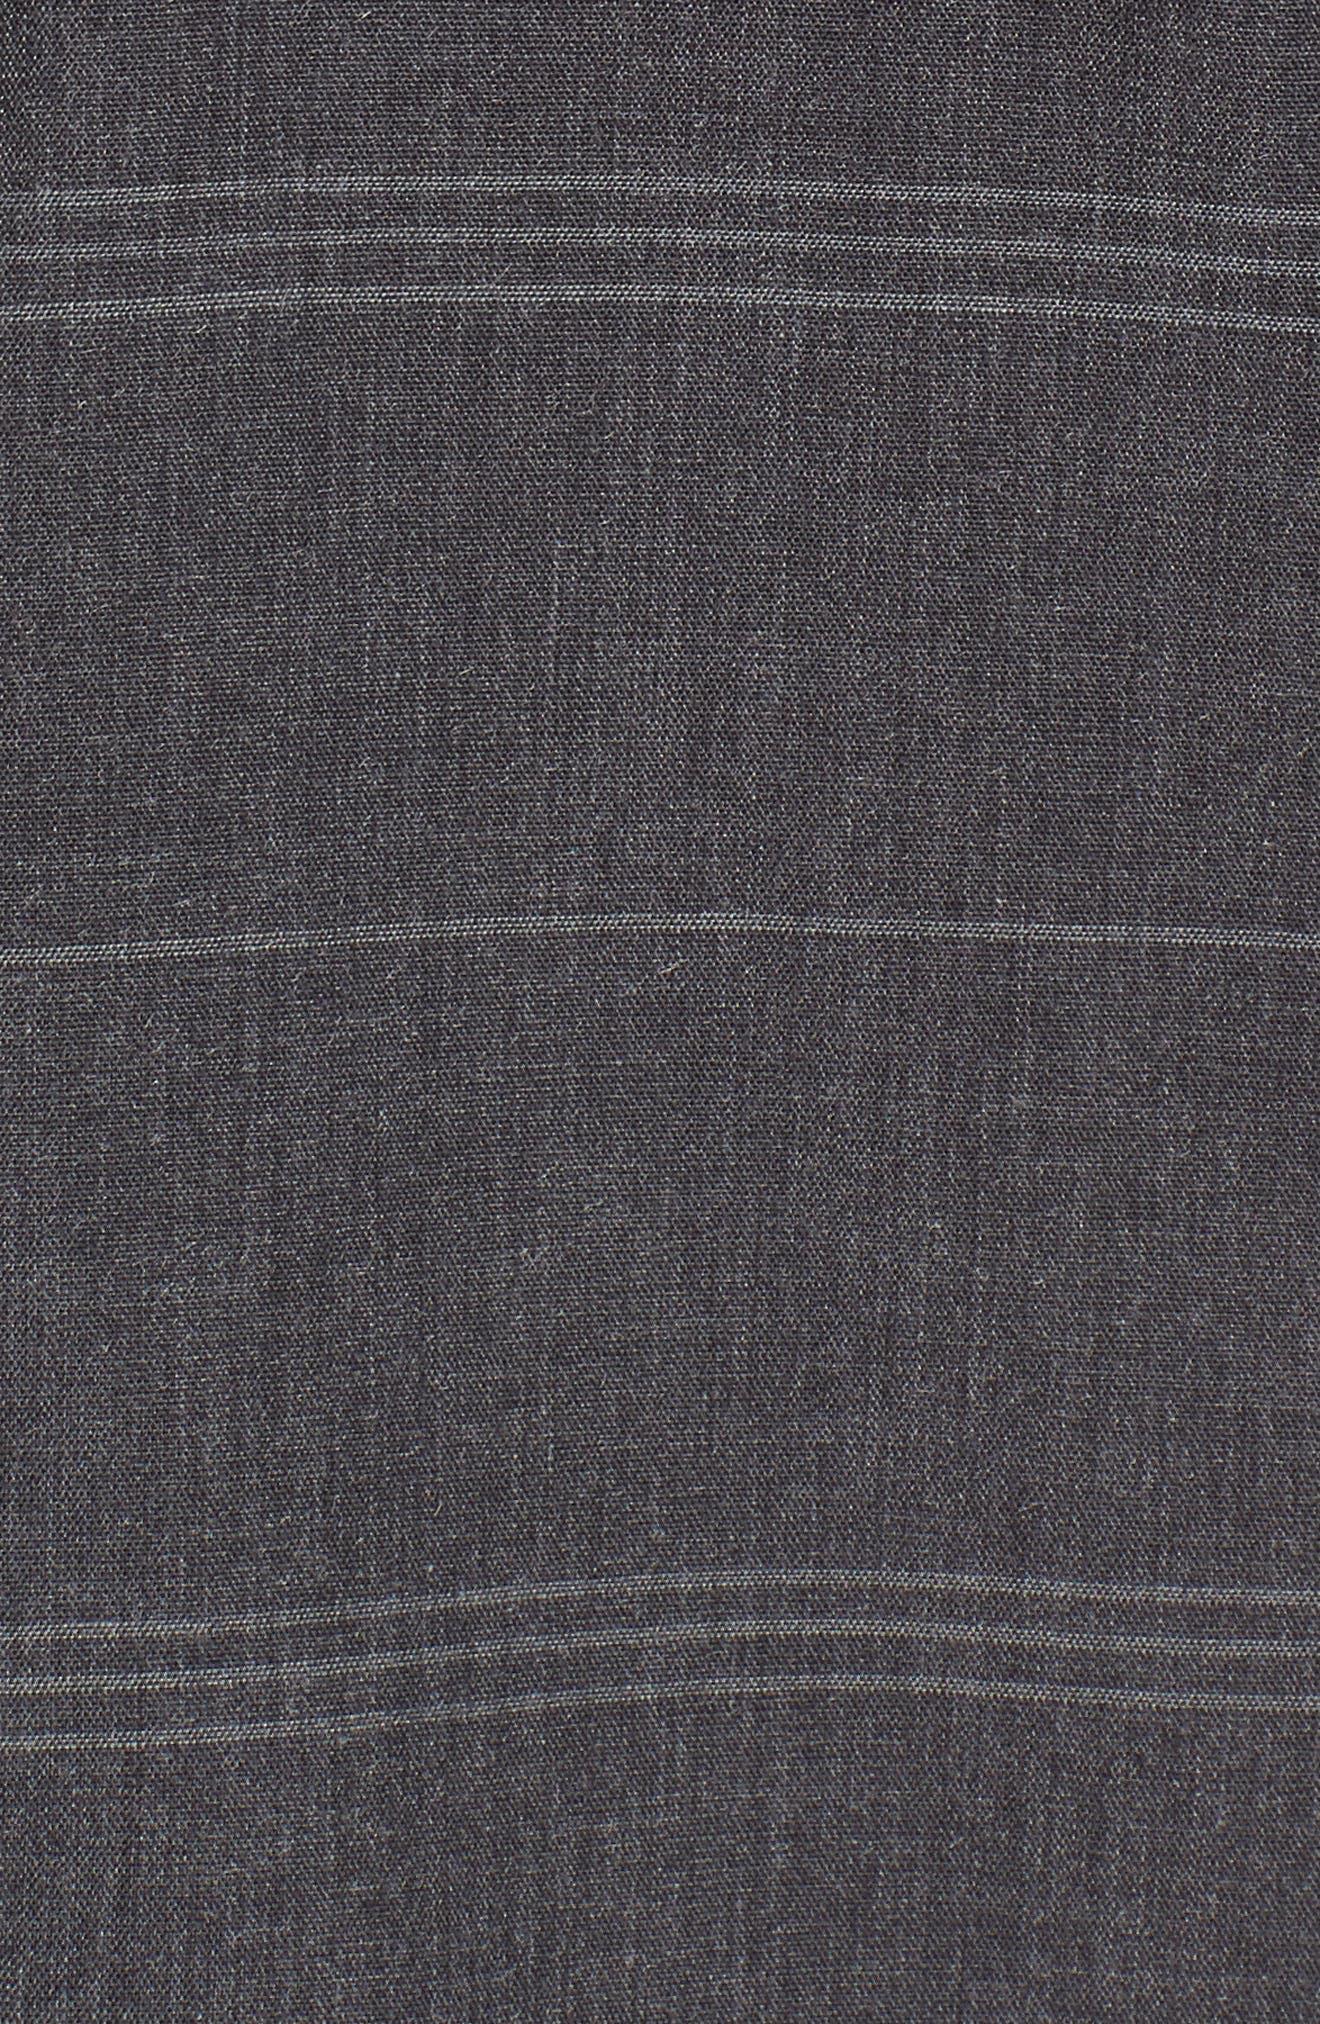 HURLEY,                             Dri-FIT Rhythm Shirt,                             Alternate thumbnail 5, color,                             010